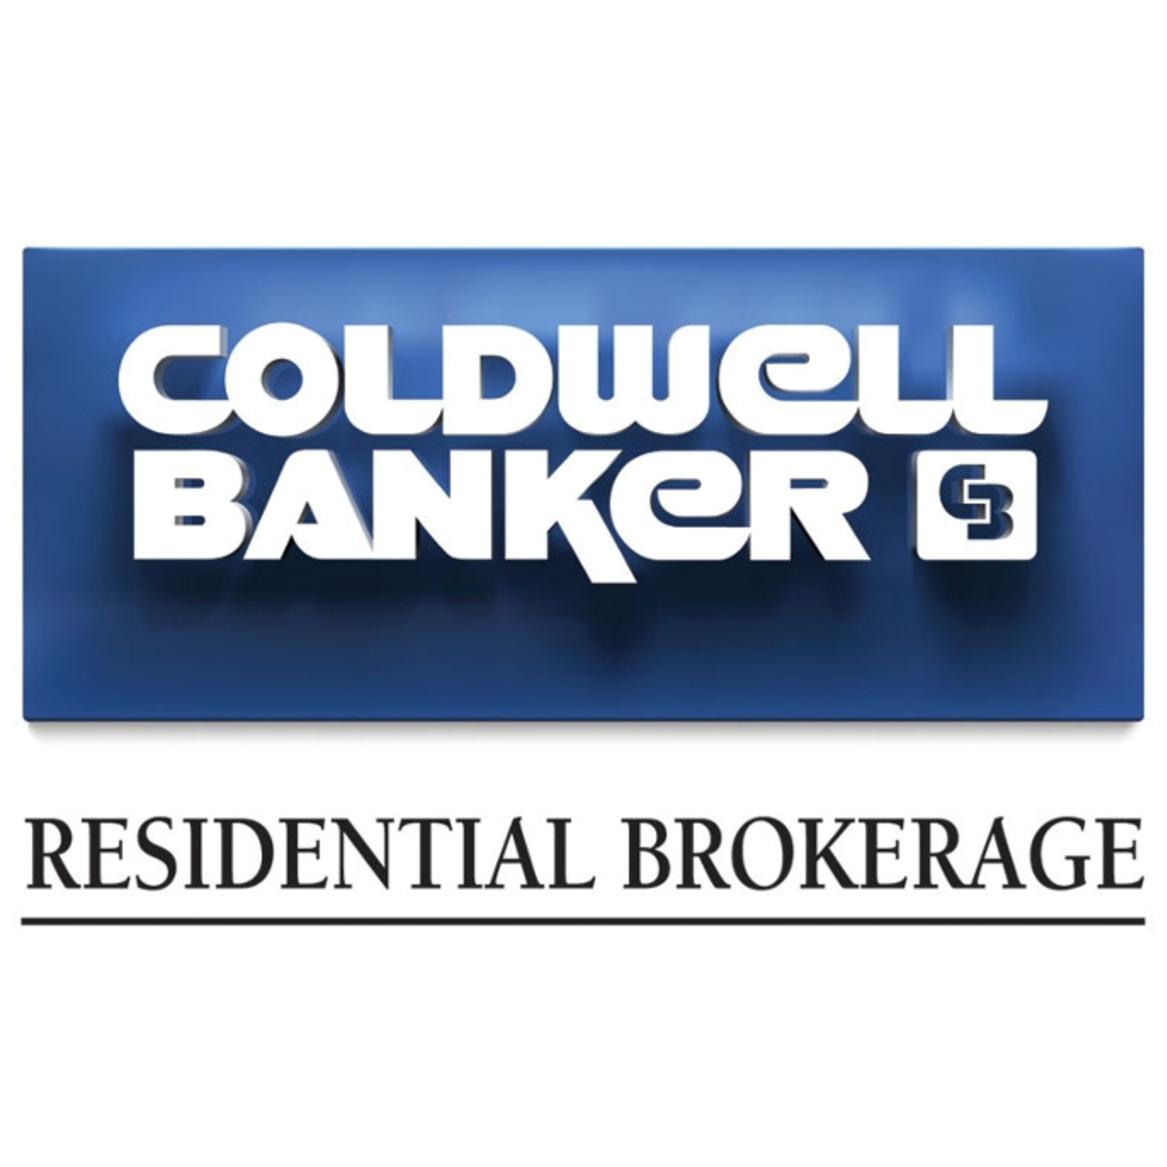 Kevin Wilgenbusch Properties - Coldwell Banker Residential Brokerage